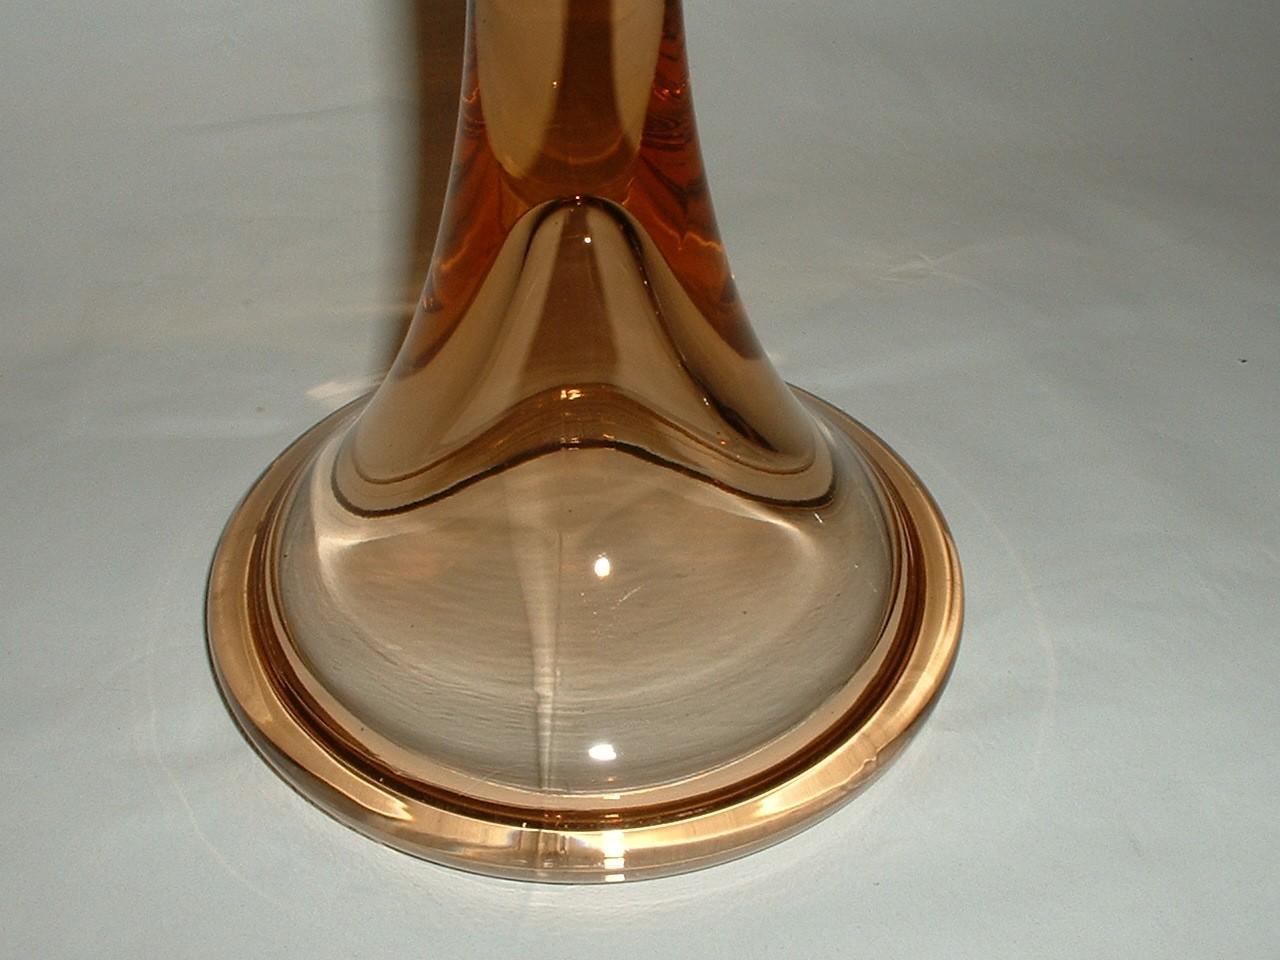 Vintage Heavy Glass 9 1/2 Inch Candlestick Holder